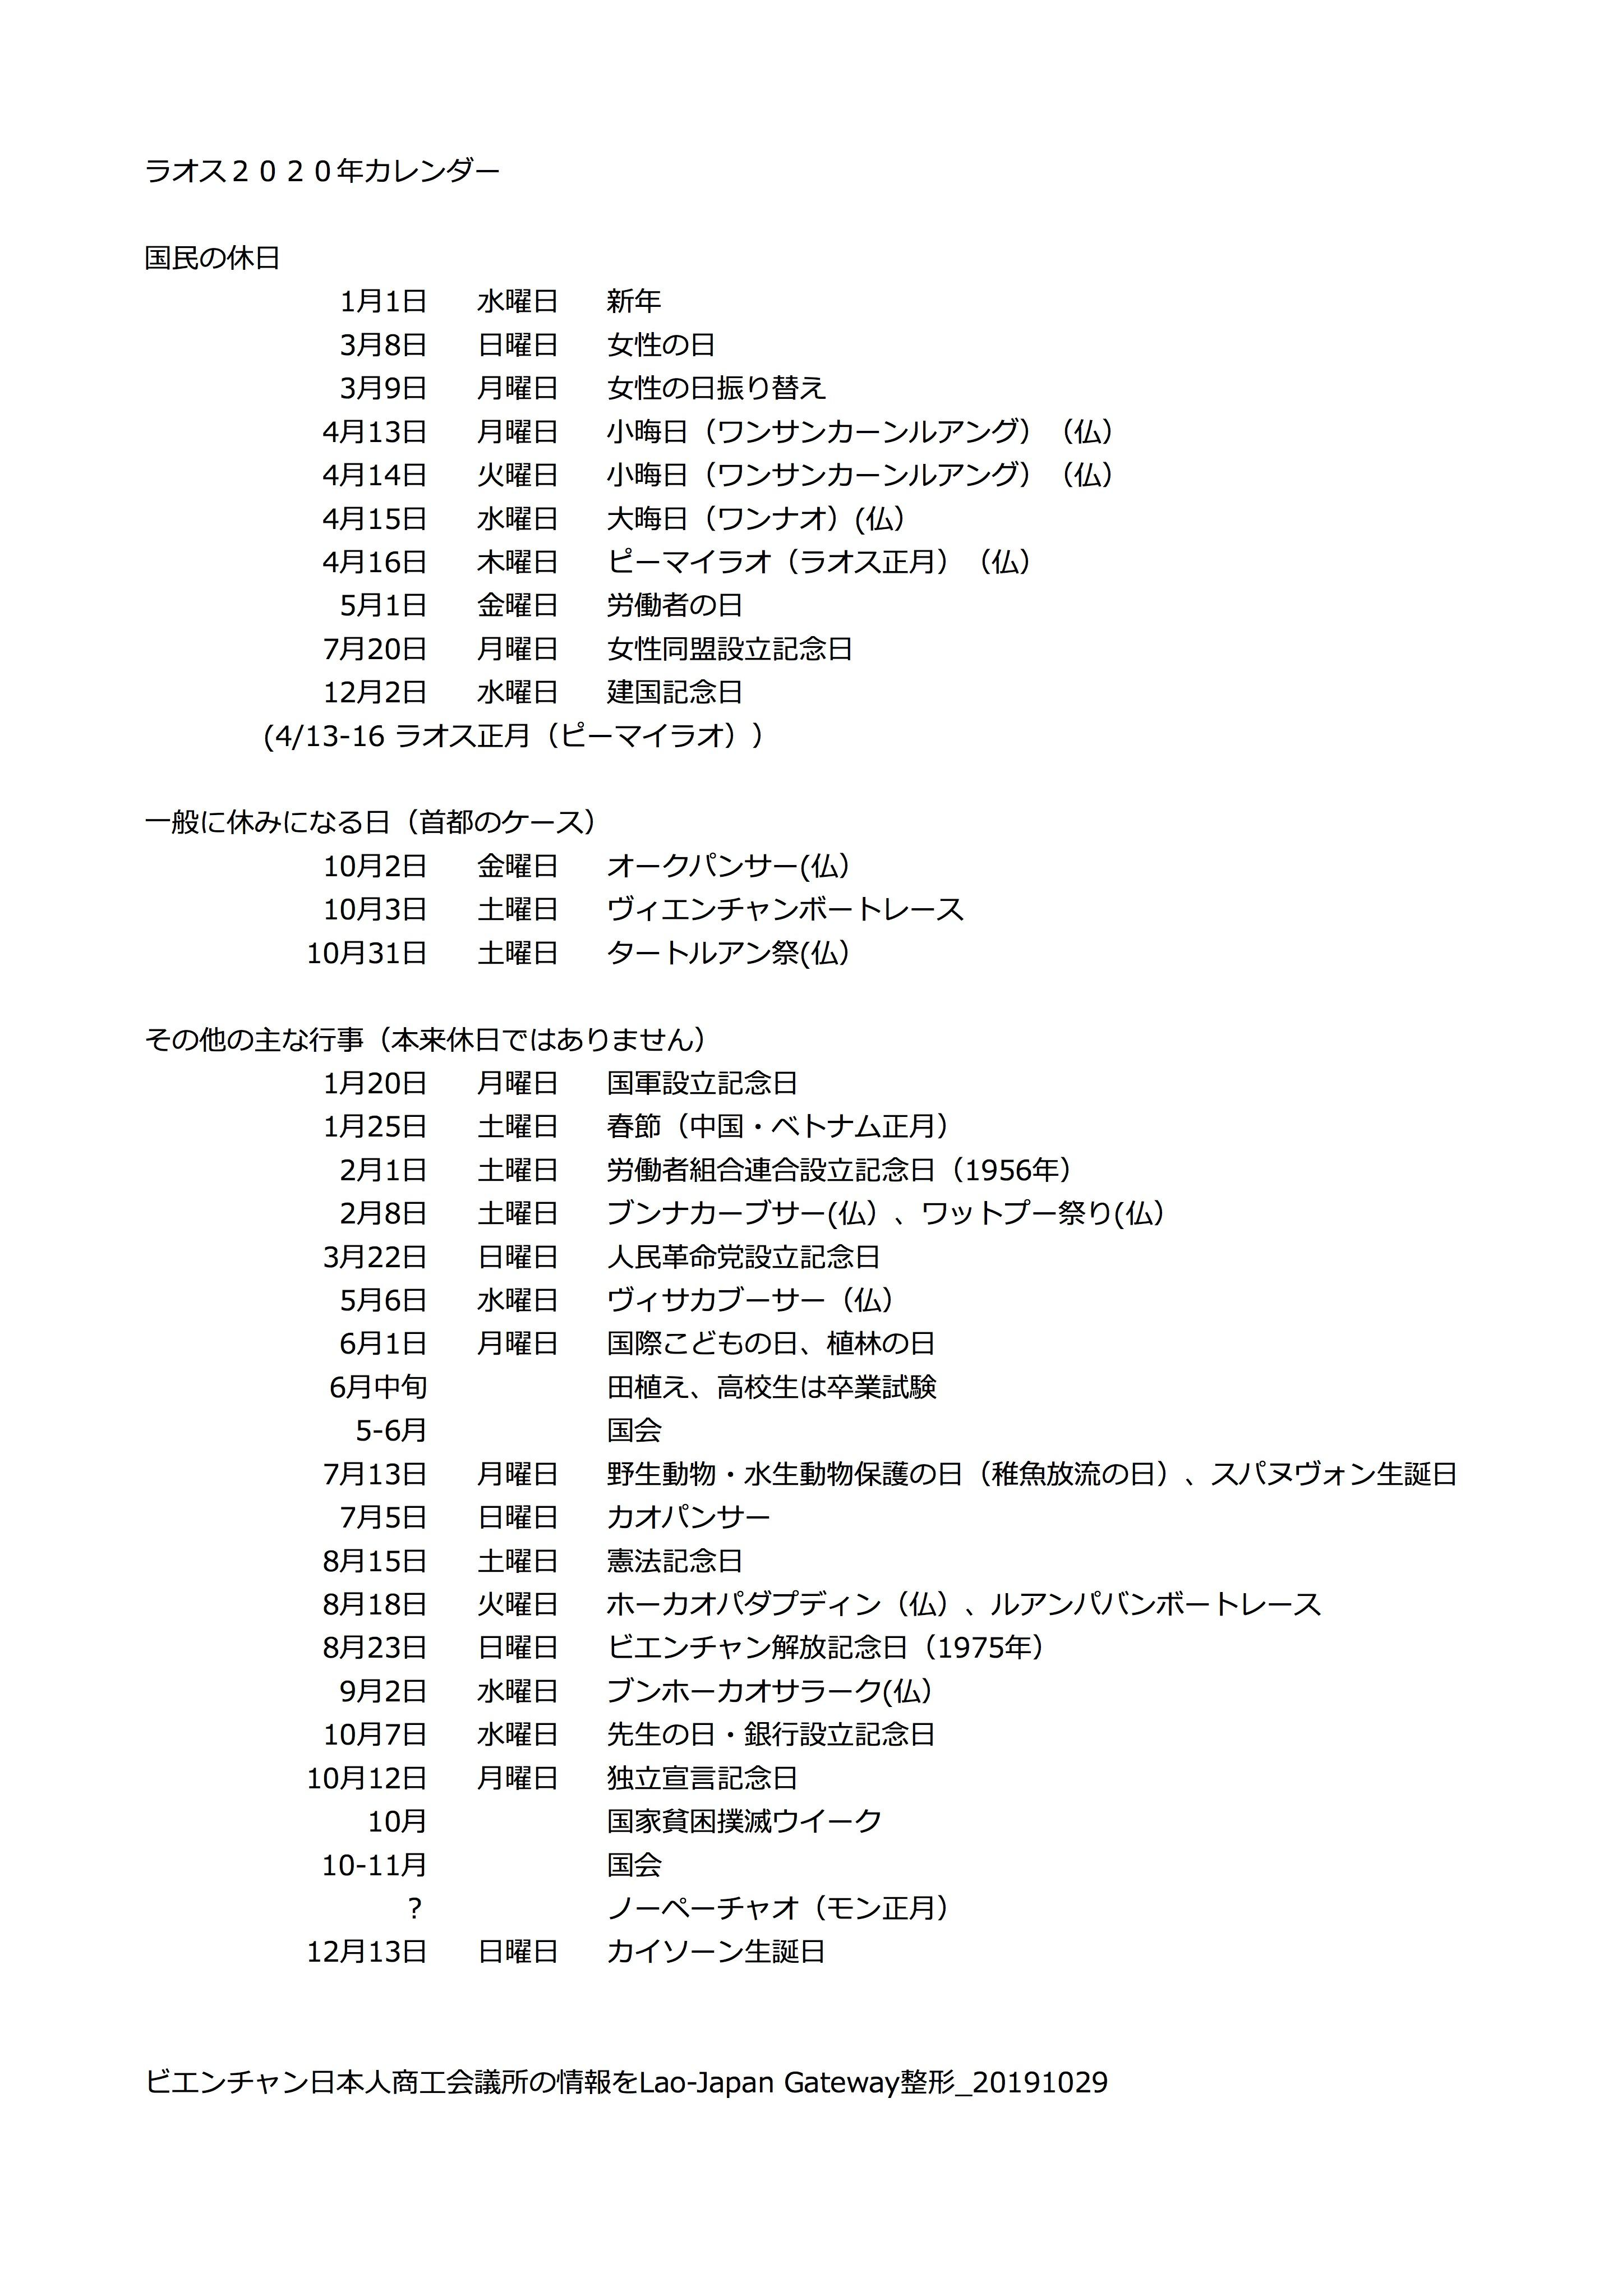 https://blogs.itmedia.co.jp/isojima/58118da8b48704ae29dd01e13b736ce59ad63b57.jpg